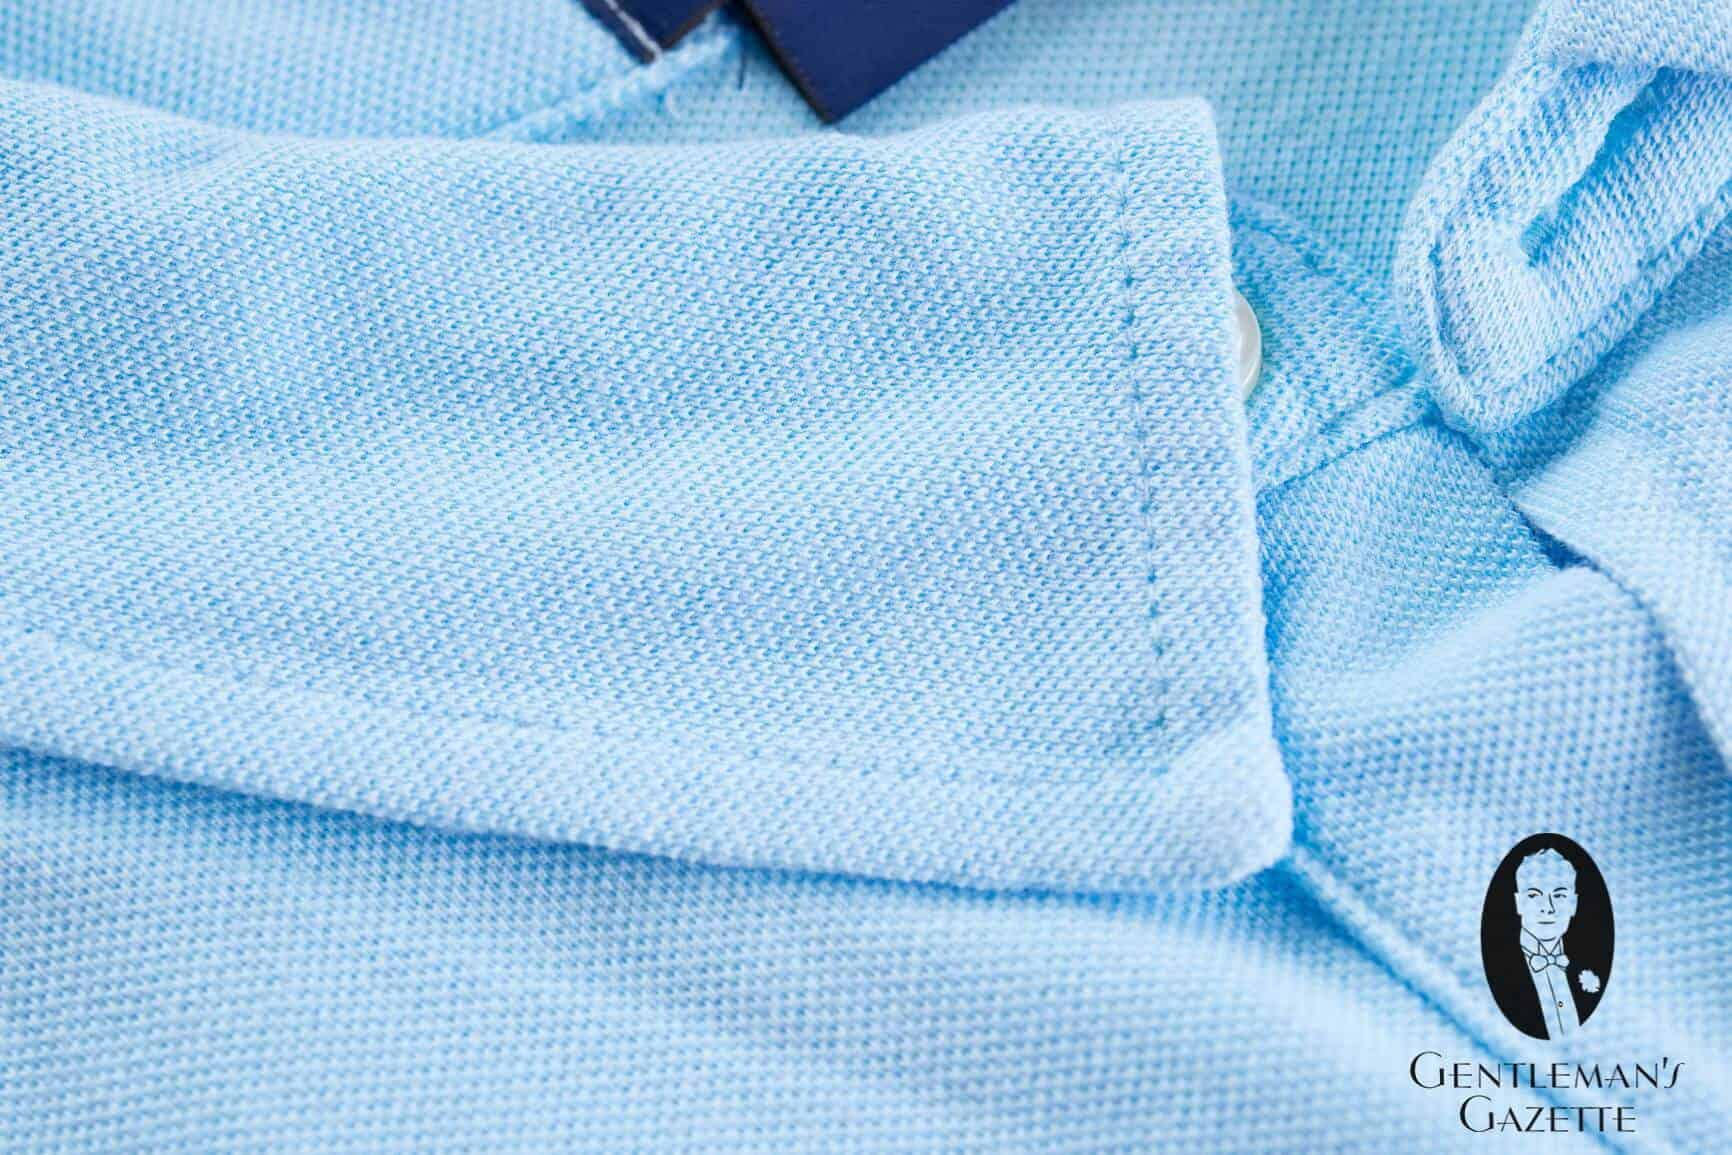 The Ultimate Polo Shirt Guide Gentlemans Gazette Tendencies Short Shirts Basic Long Collar Less Wine Burgundy L Sewn Style